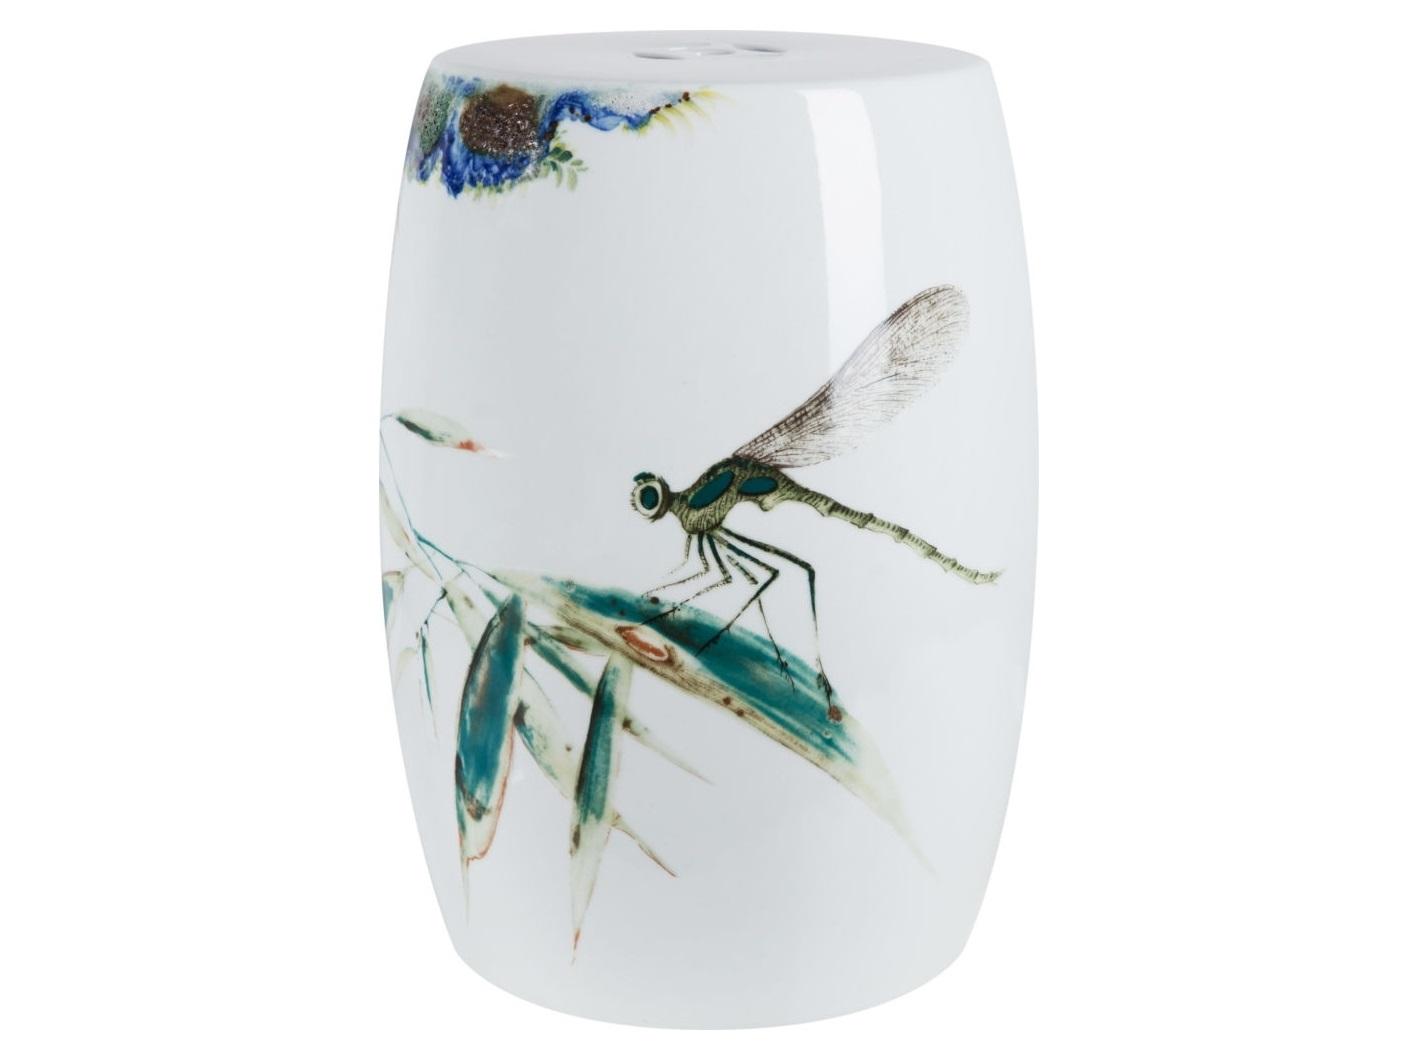 Табурет DragonflyТабуреты<br><br><br>Material: Керамика<br>Ширина см: 33.0<br>Высота см: 46.0<br>Глубина см: 49.0